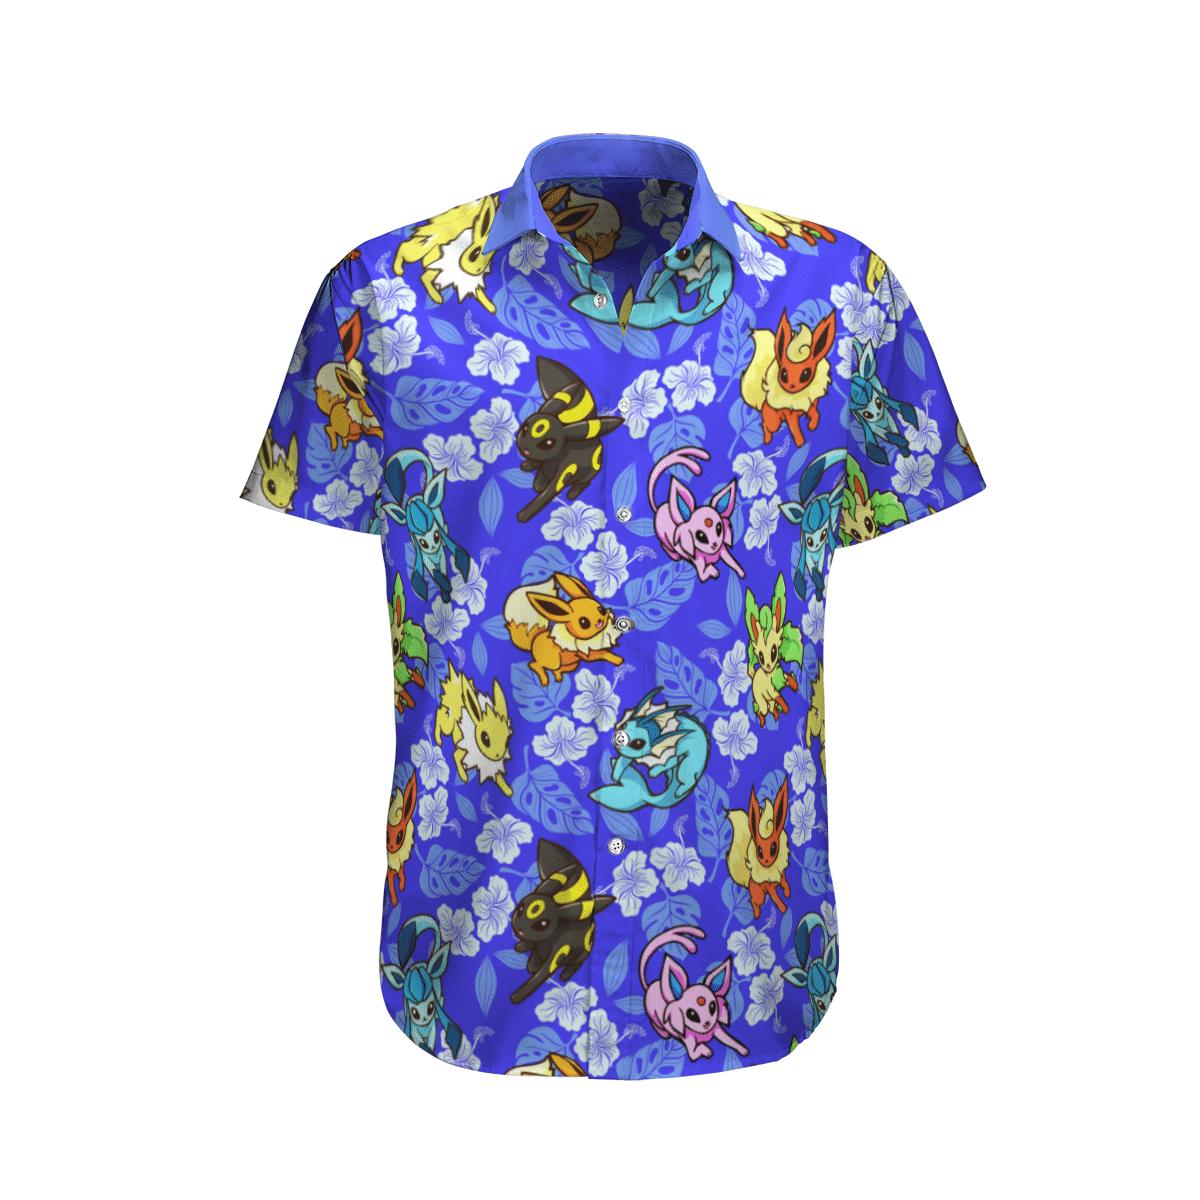 Pokemon Eevee Tropical Beach Hawaiian Shirt And Shorts